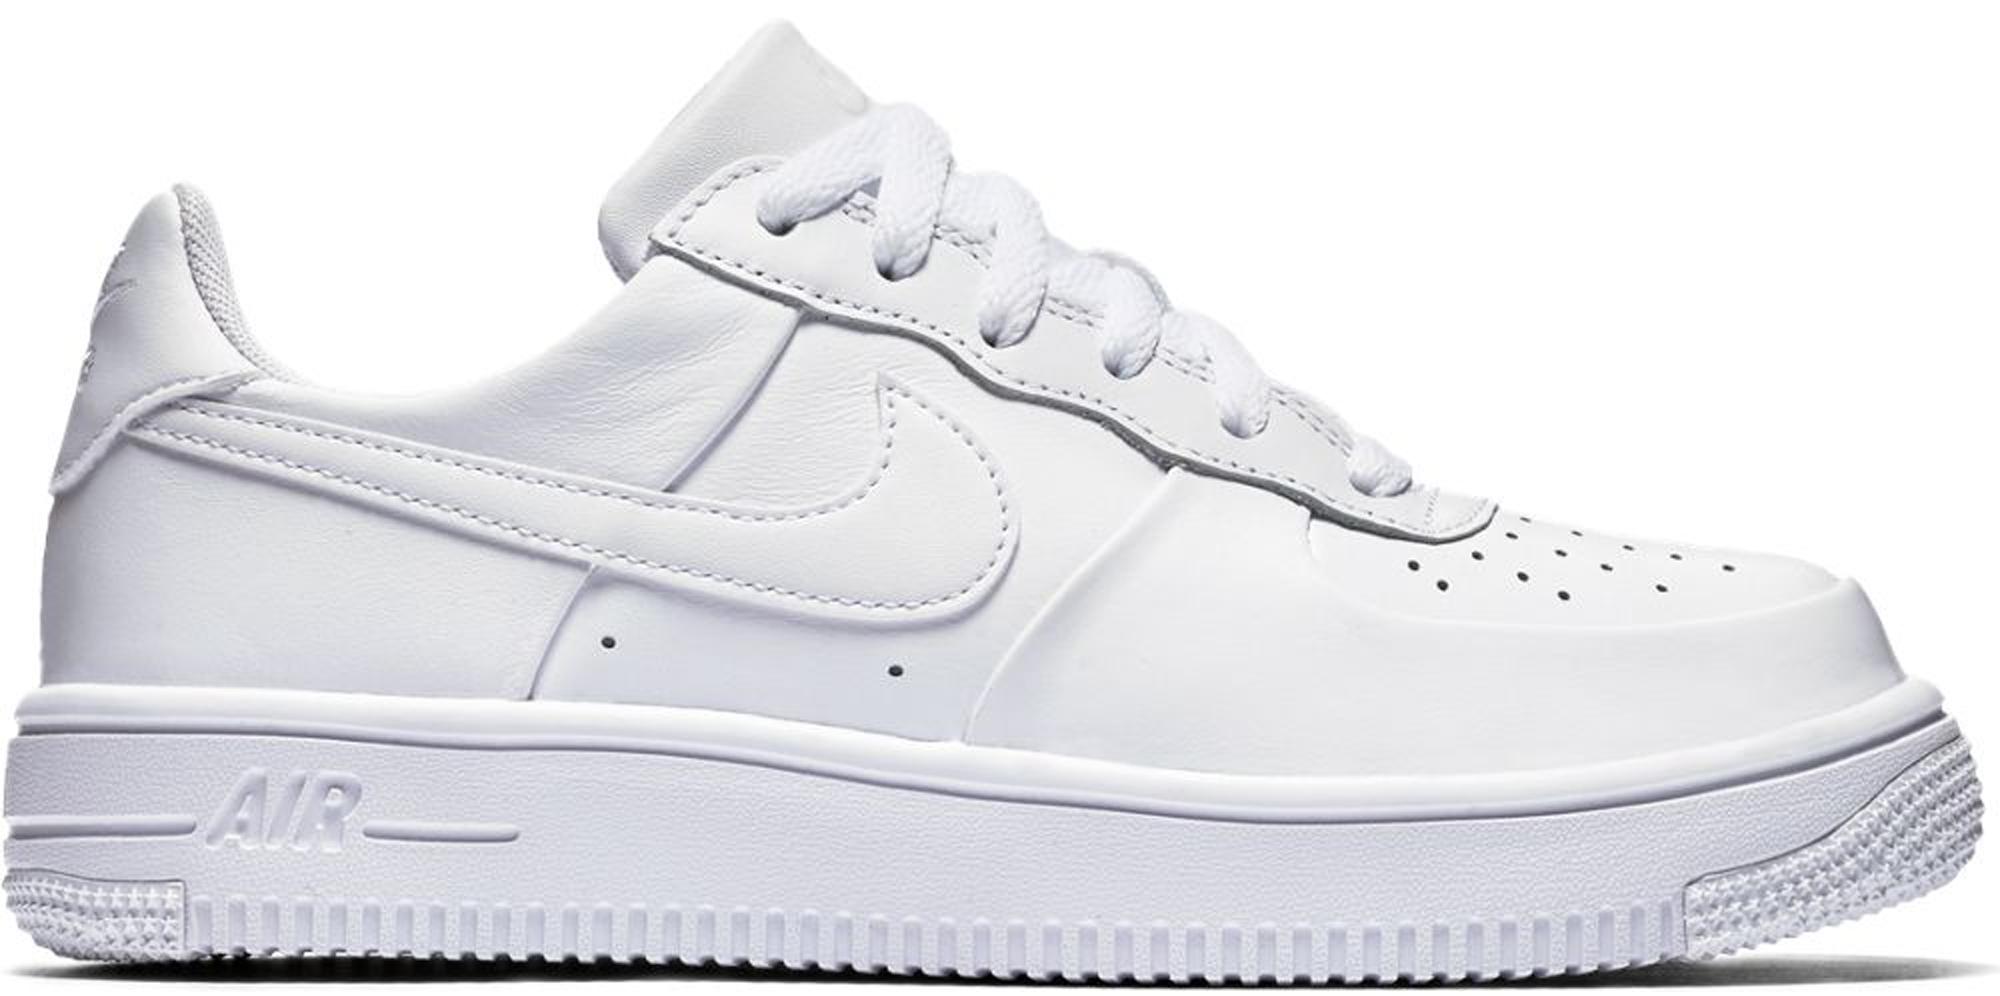 Nike Air Force 1 Ultraforce Low Triple